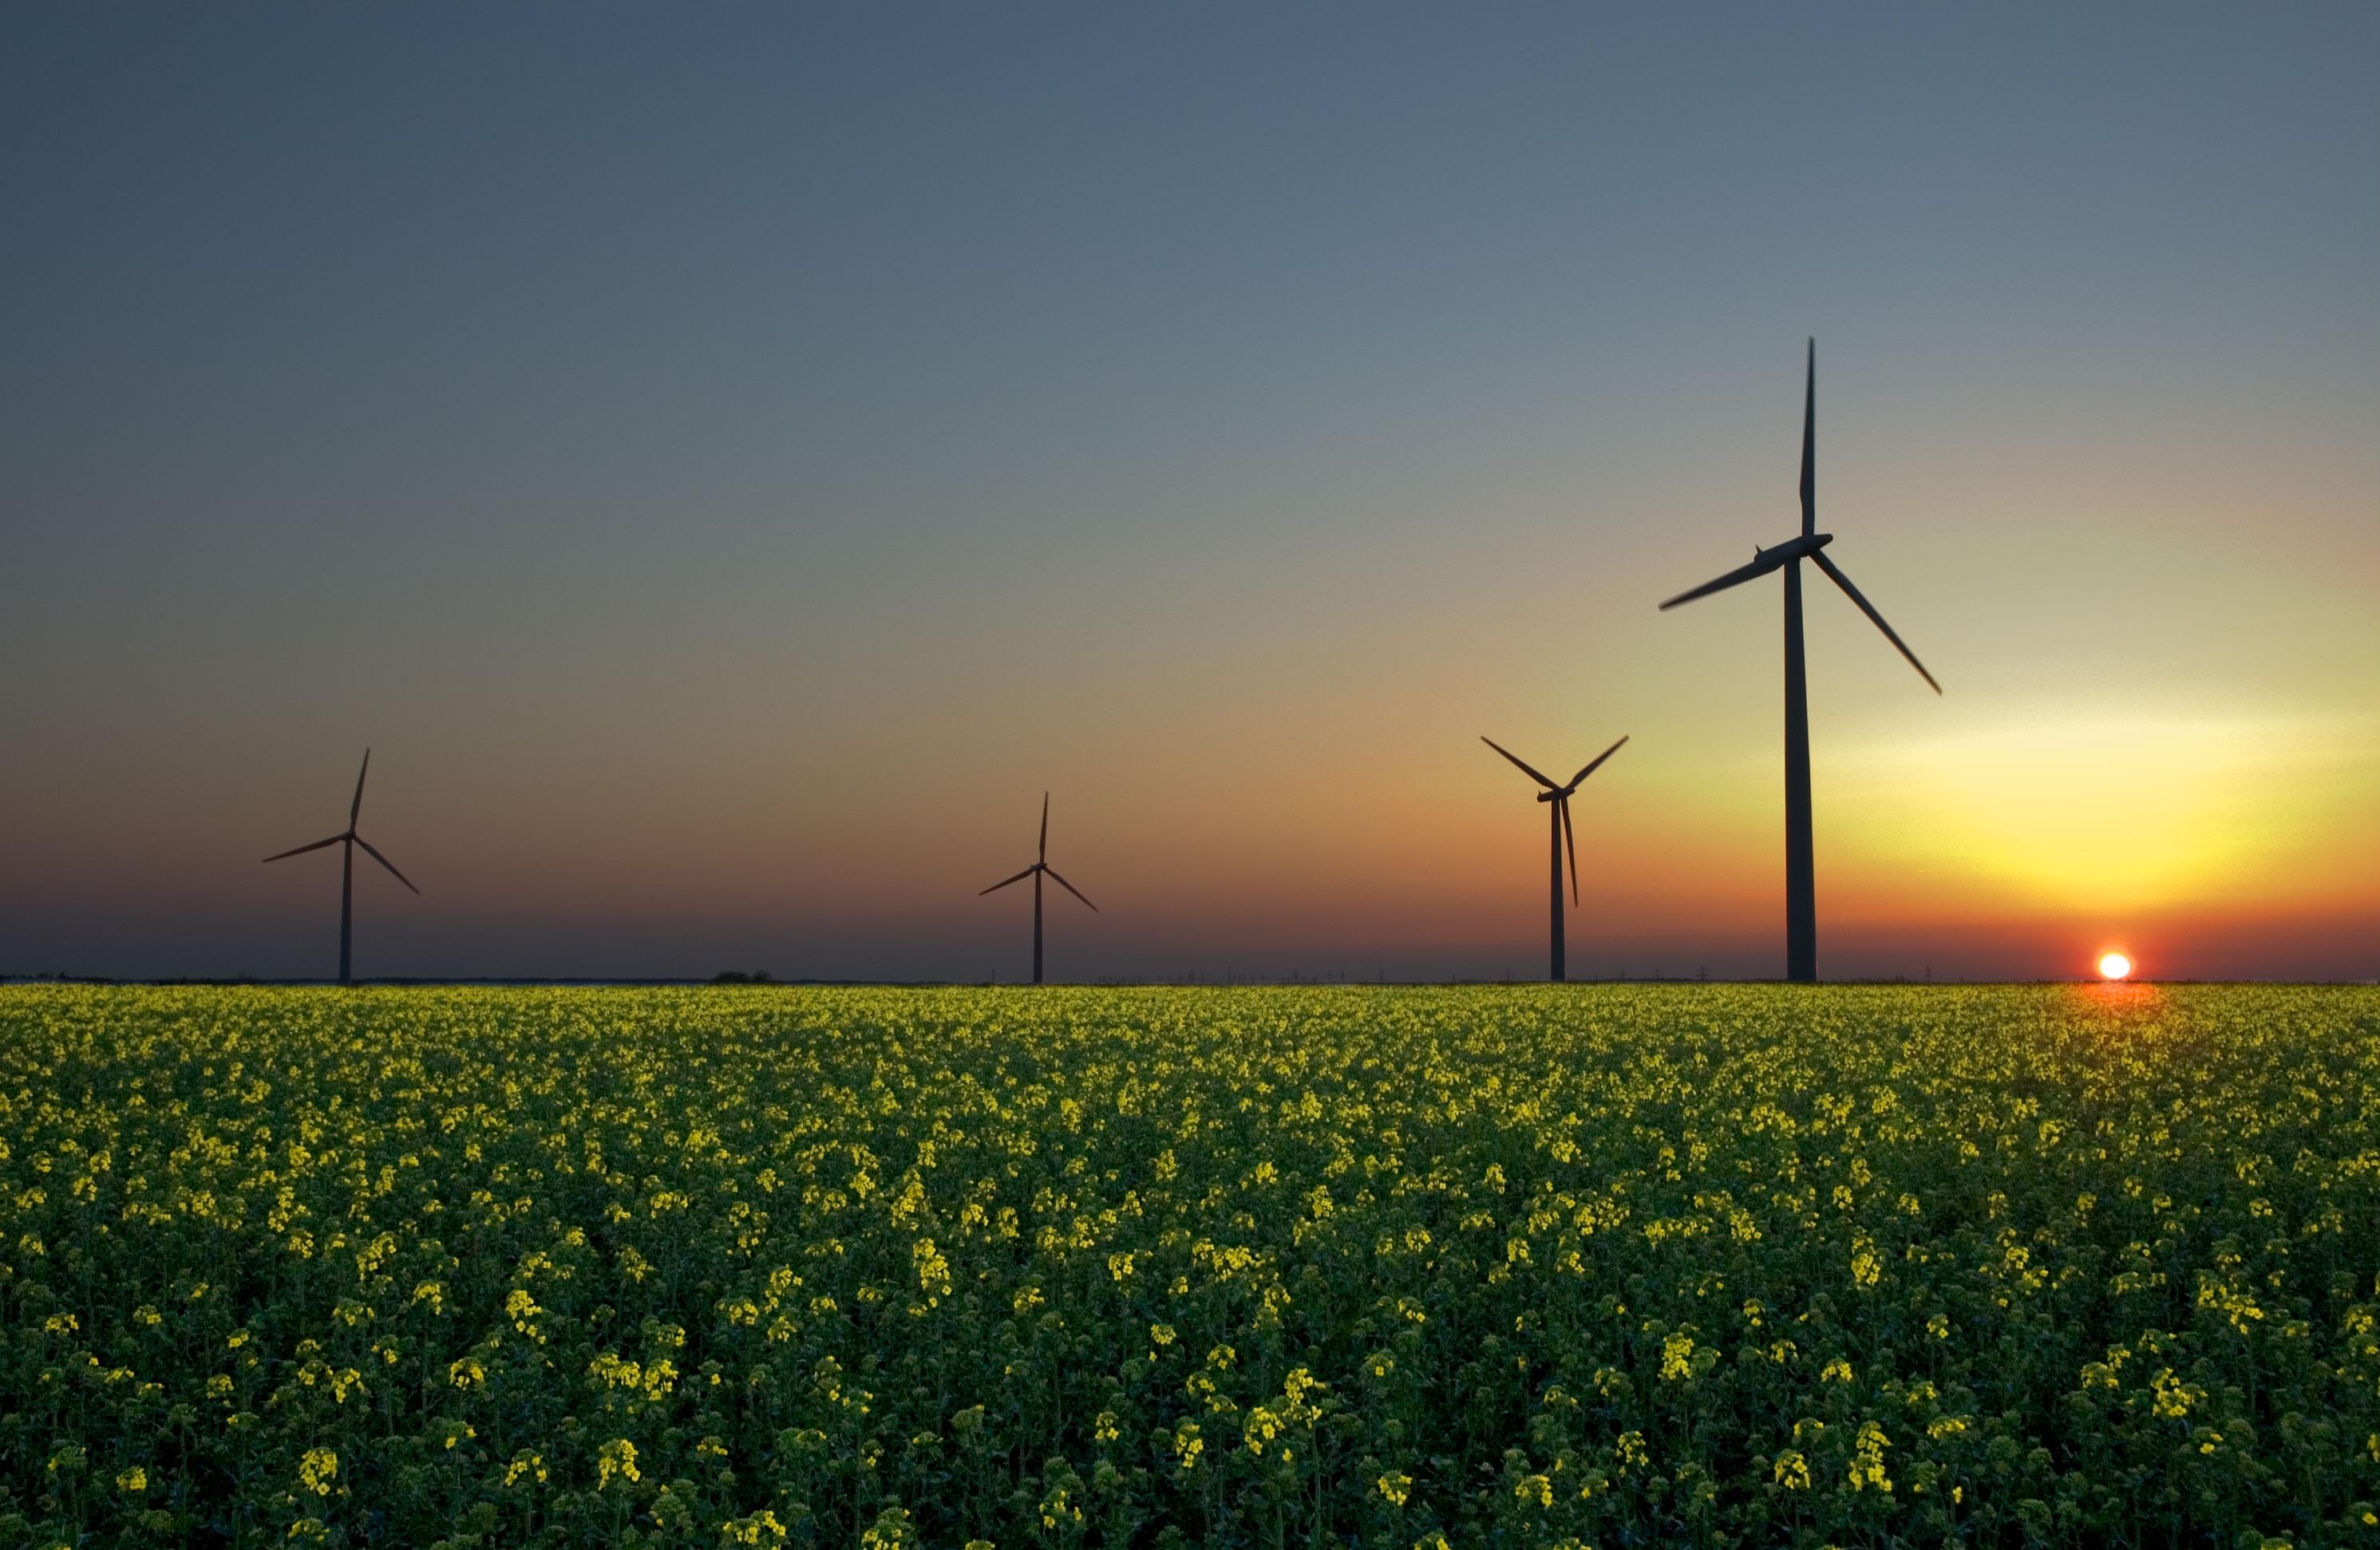 "<I>Photo: <a href=""http://en.wikipedia.org/wiki/Renewable_energy"" target=""_blank"">Wikimedia Commons</a>.</I>"